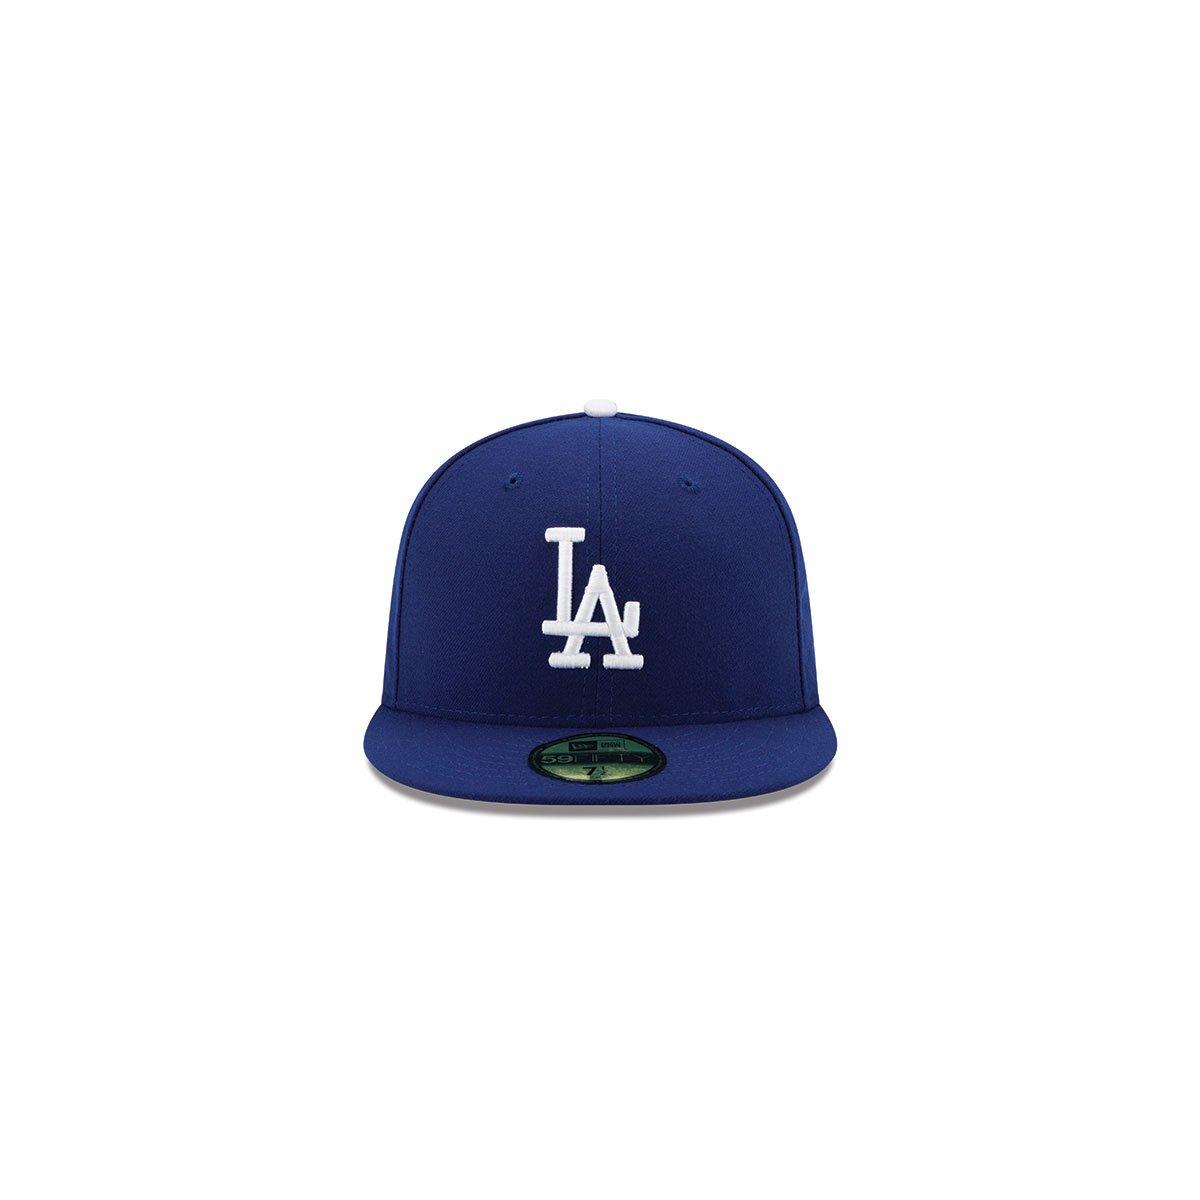 GORRA DEPORTIVA LOS ANGELES DODGERS NEW ERA  6bace2f2693